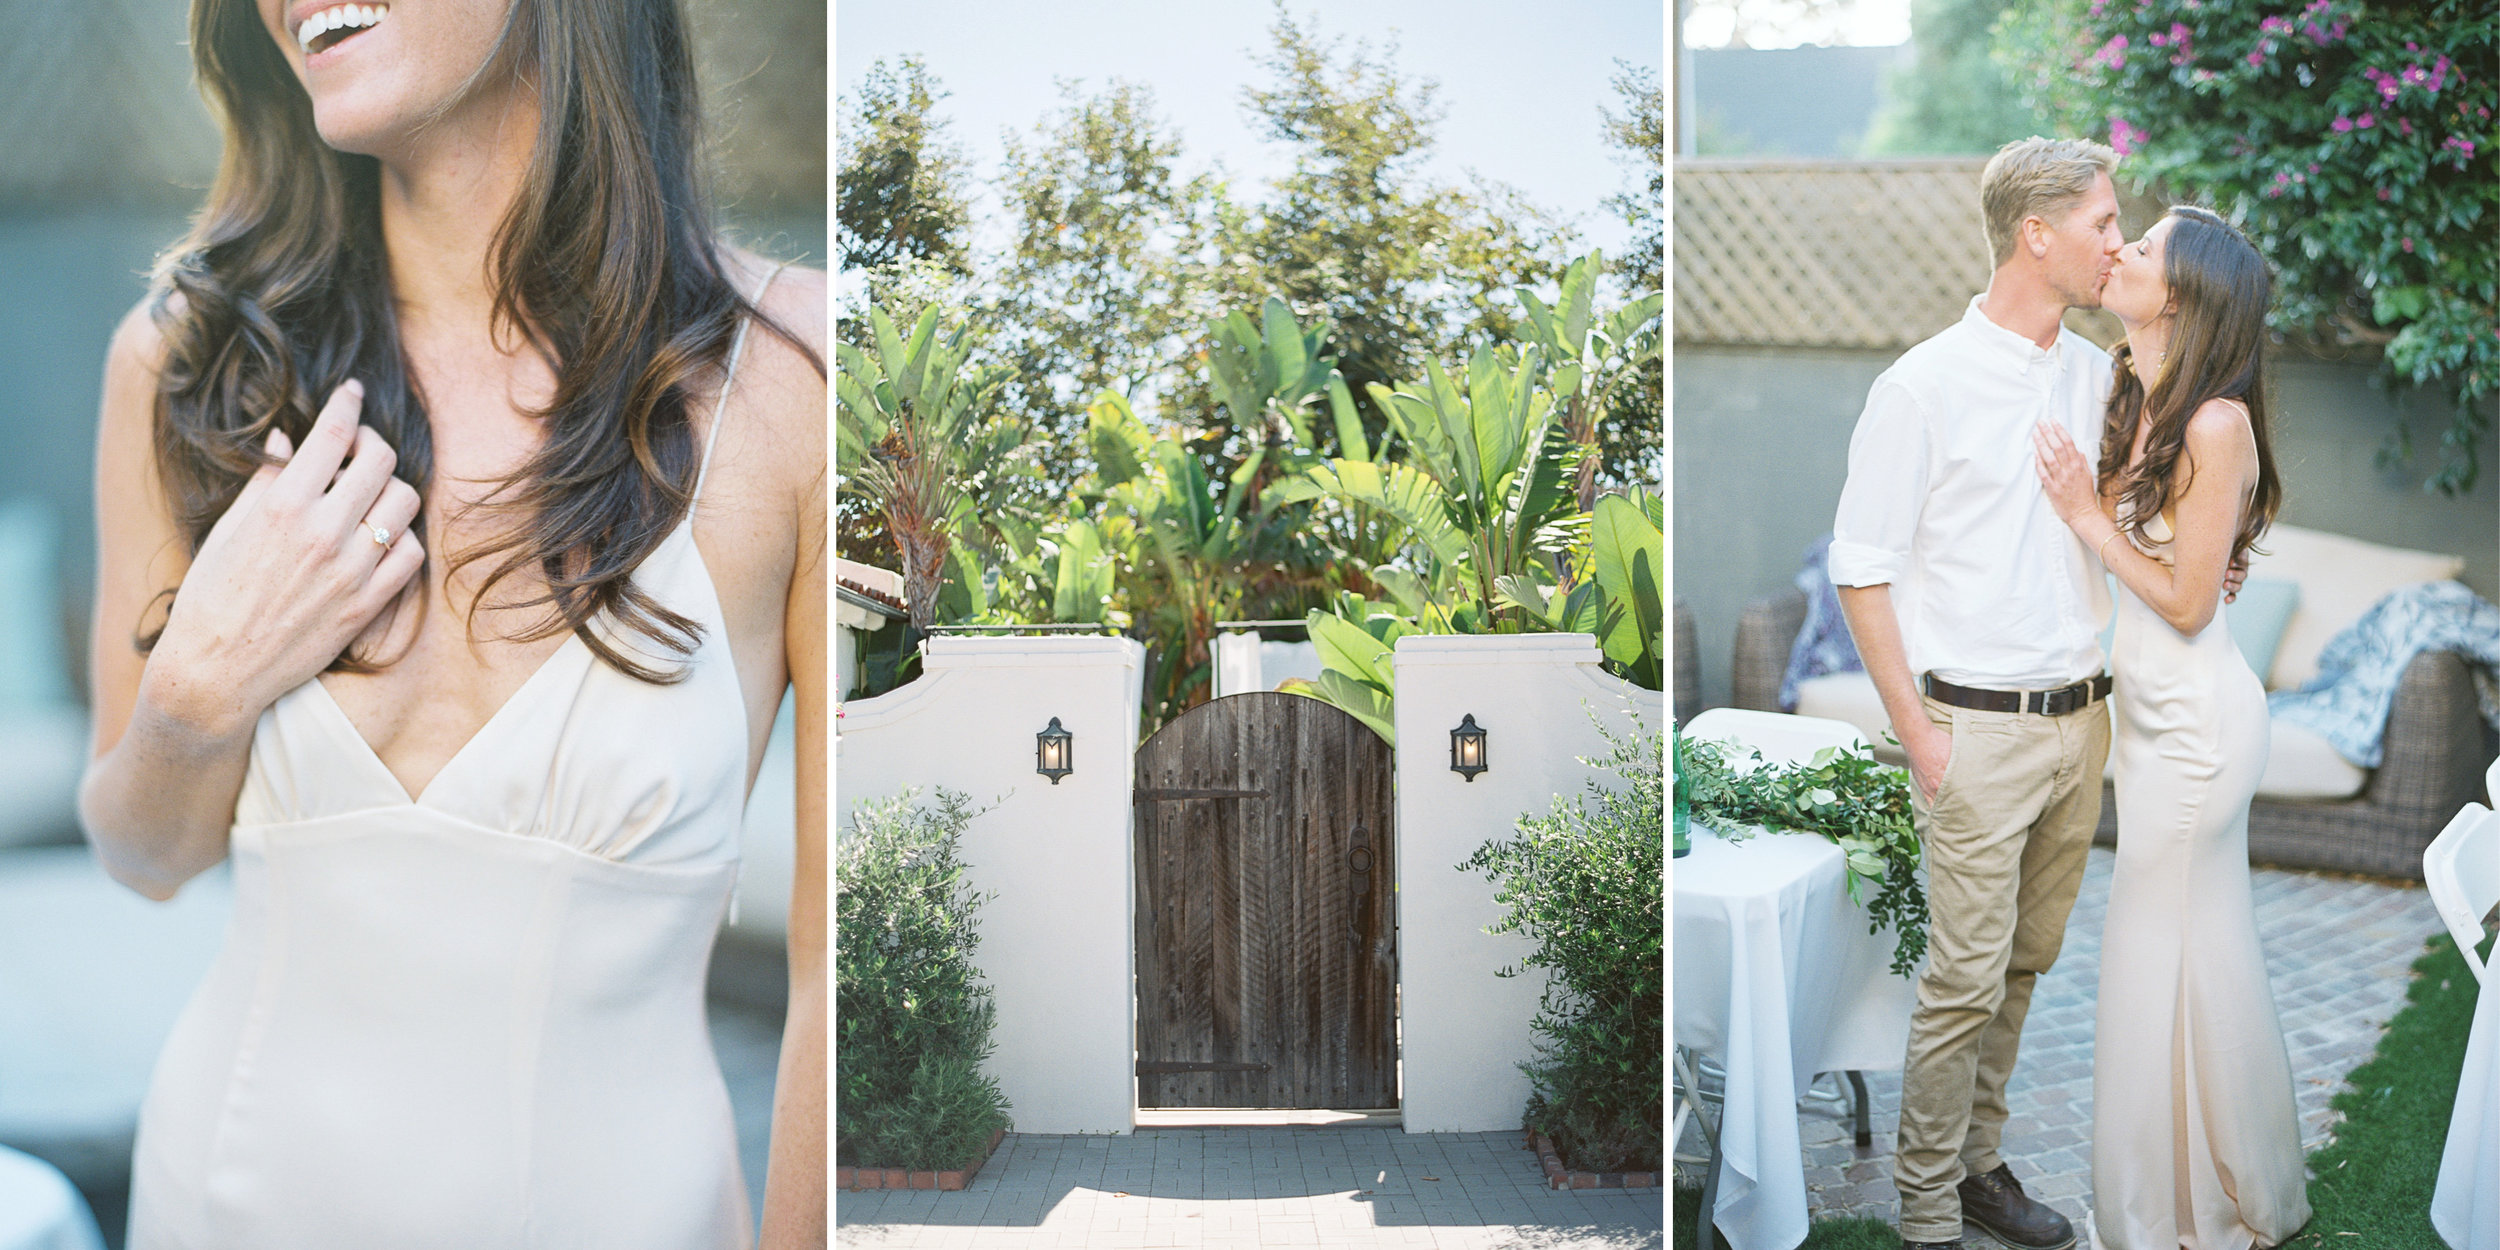 RachelOwensPhotography - 1.jpg